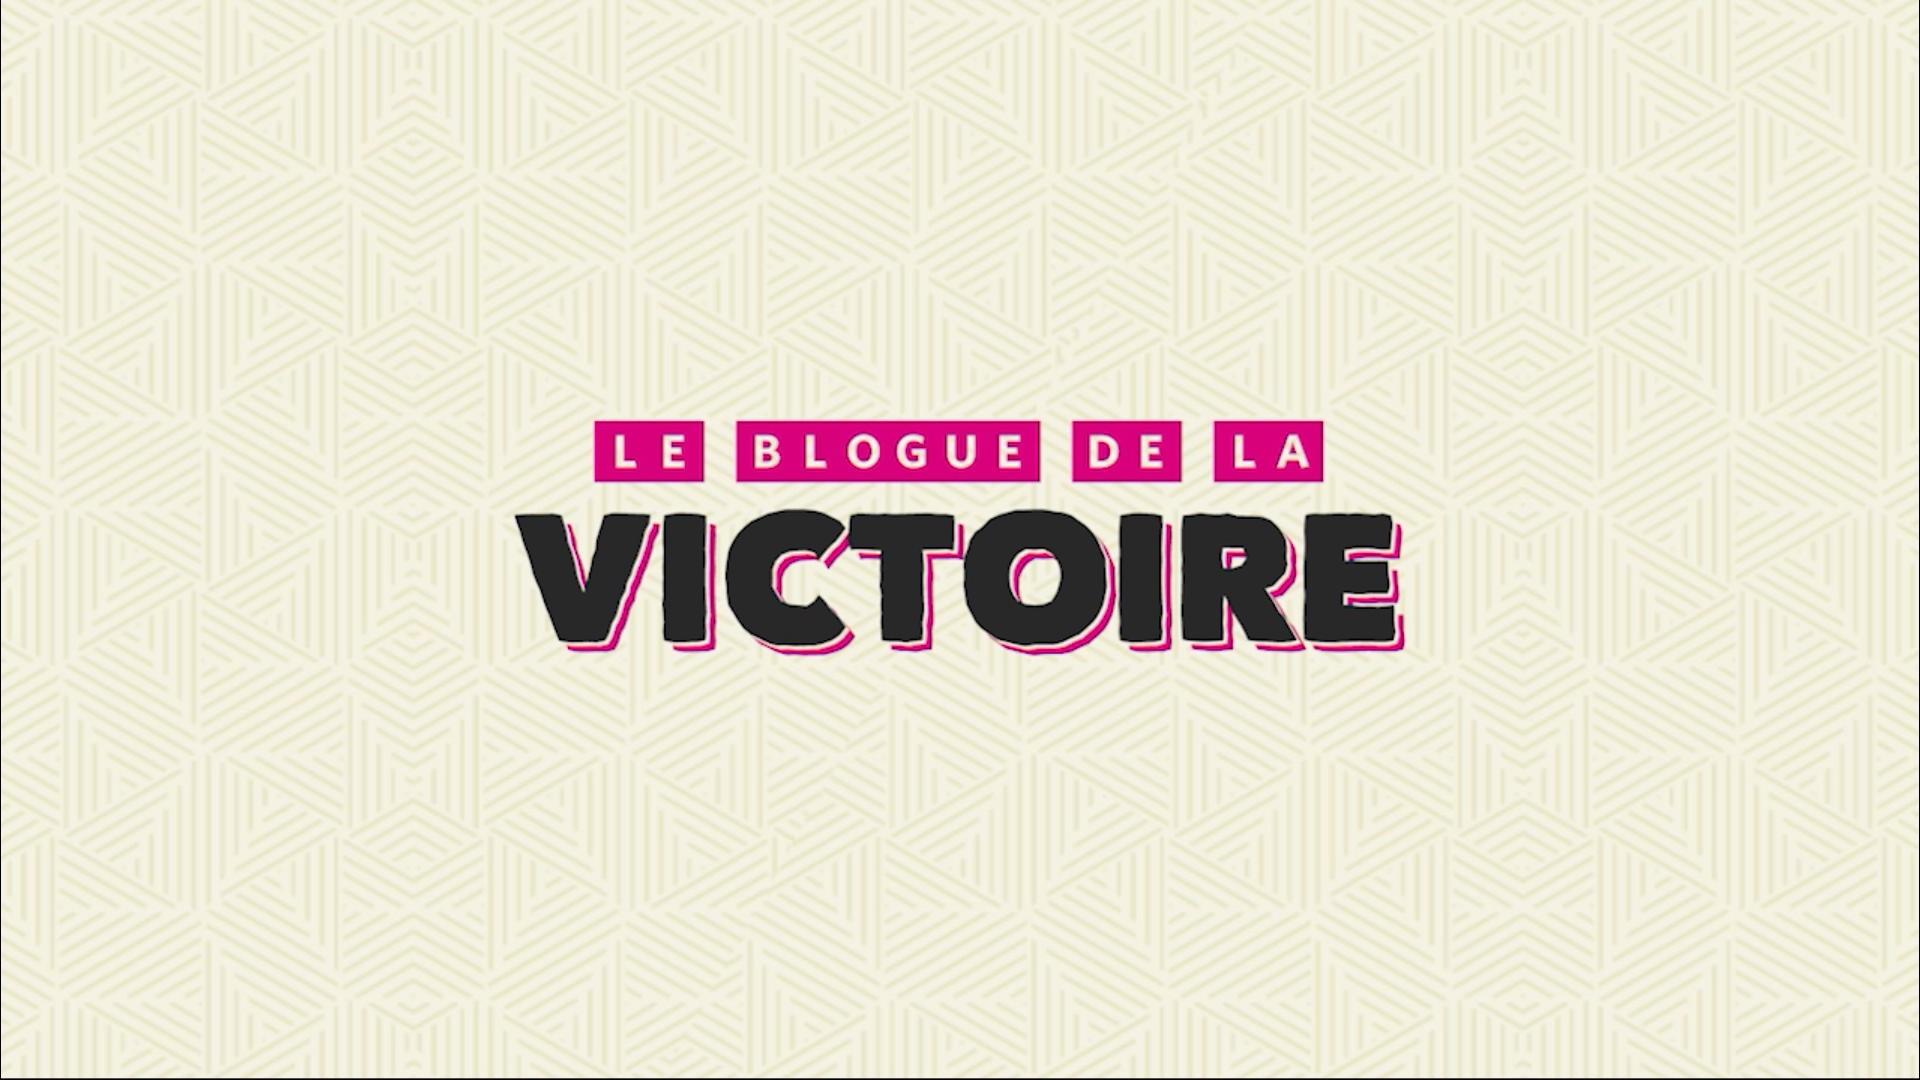 Blogue de la victoire subito texto zone vid o t l qu bec for Le journal de la